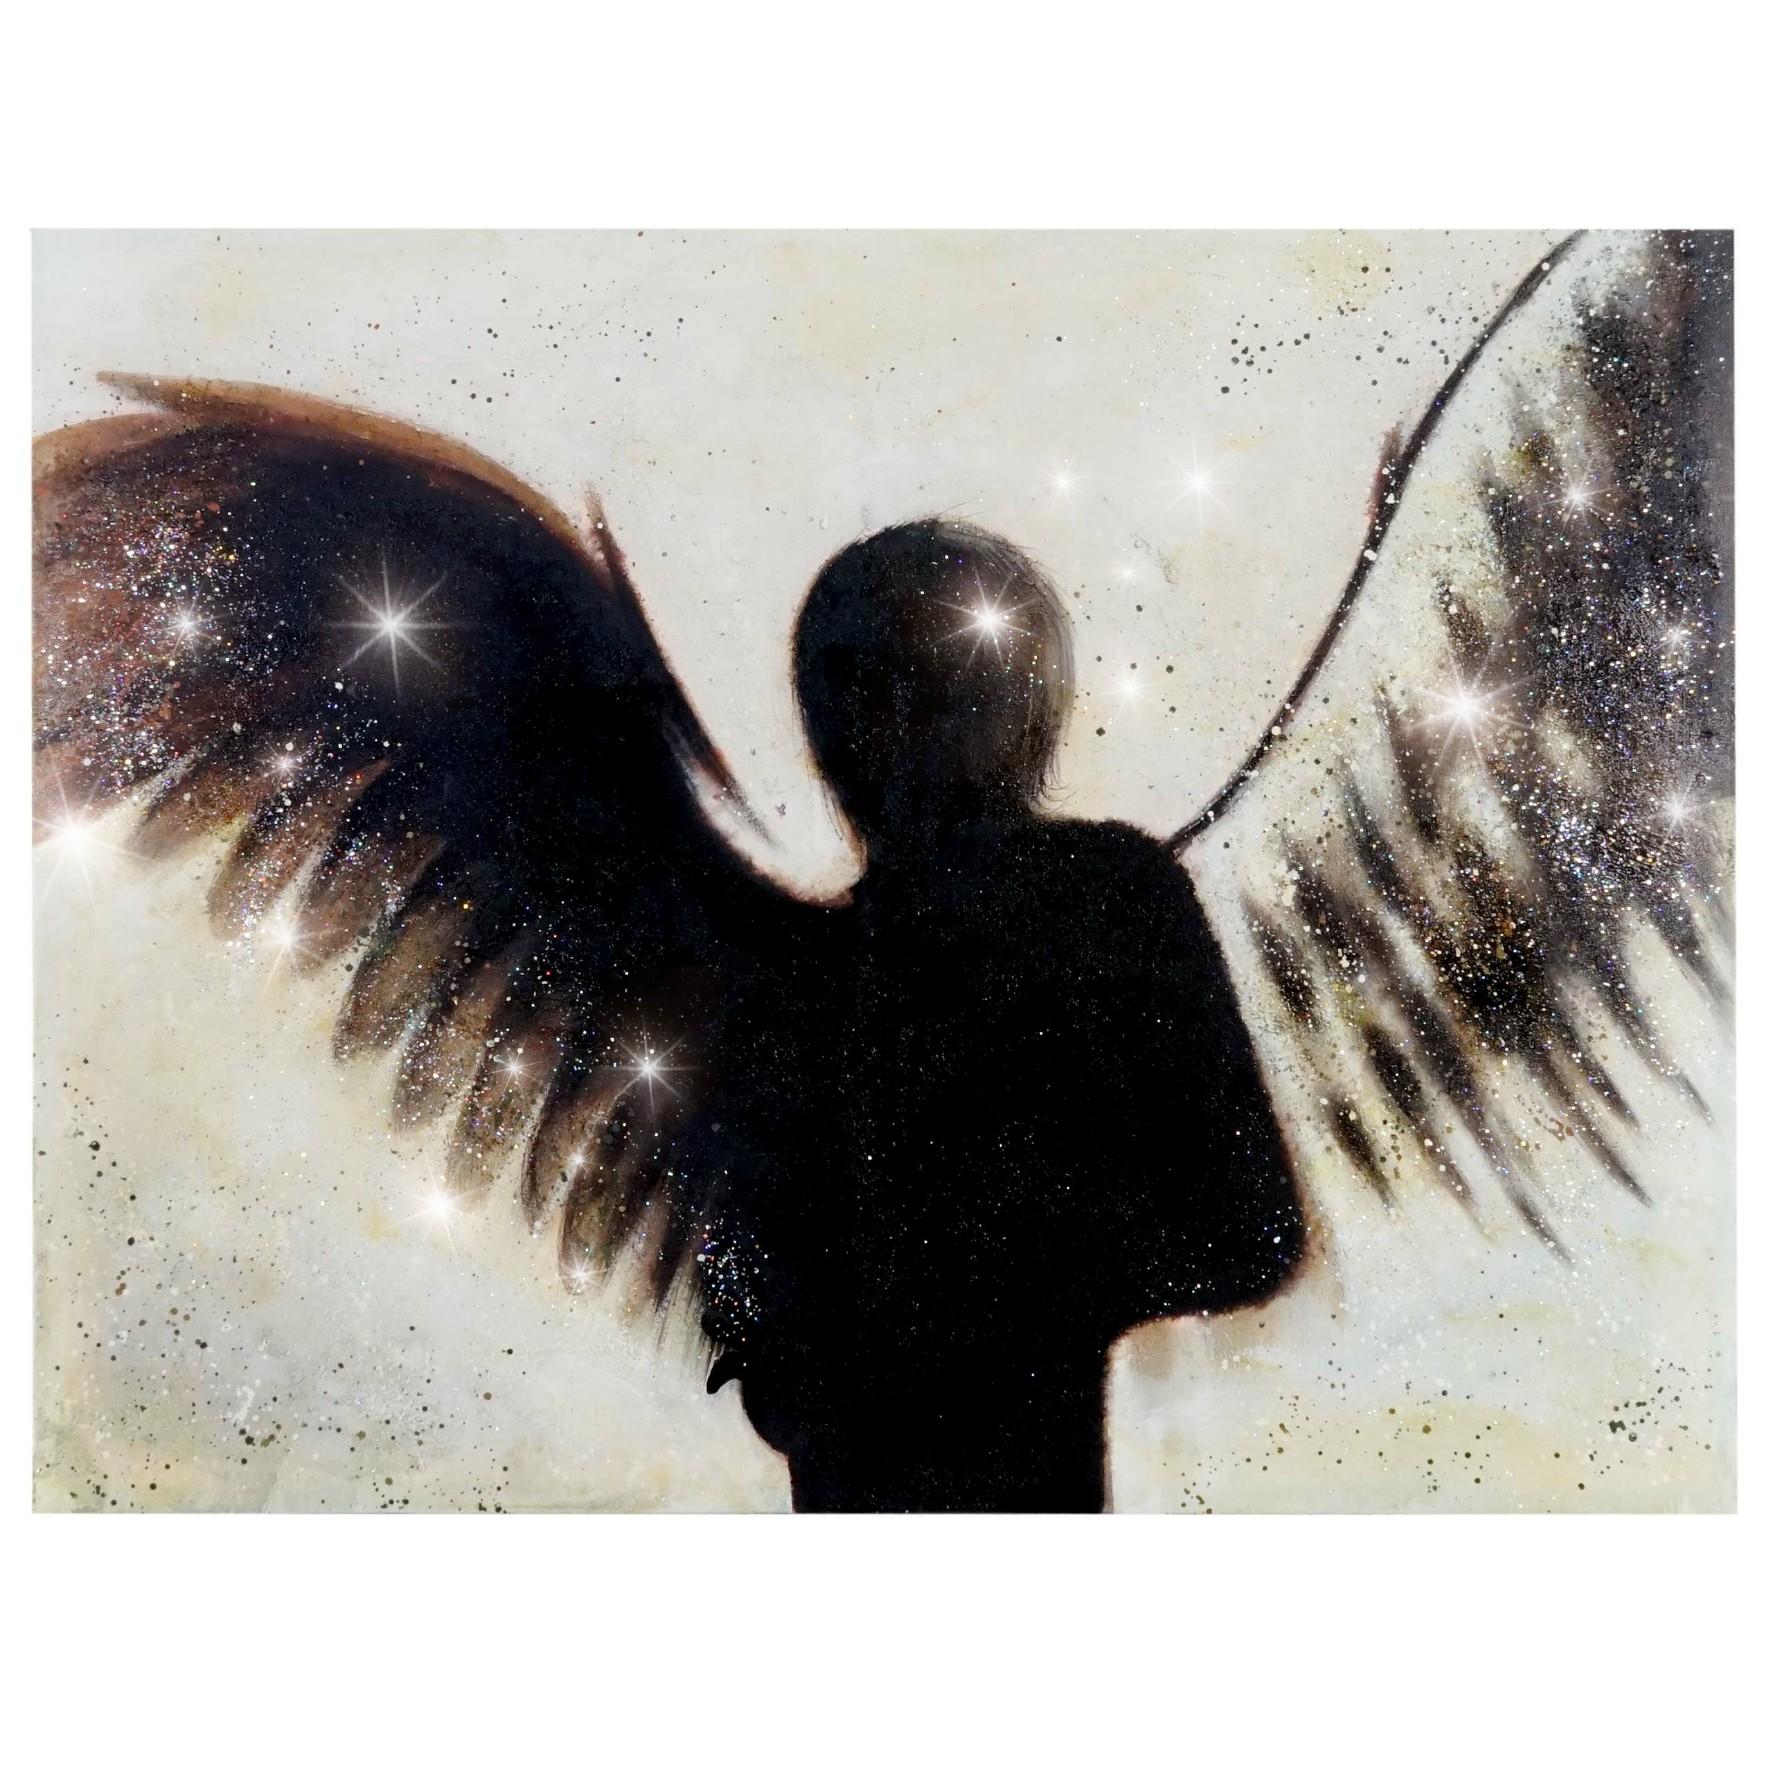 Mendler Ölgemälde Engel, 100% handgemaltes Wandbild Gemälde XL, 120x90cm ~ Variantenangebot 44746